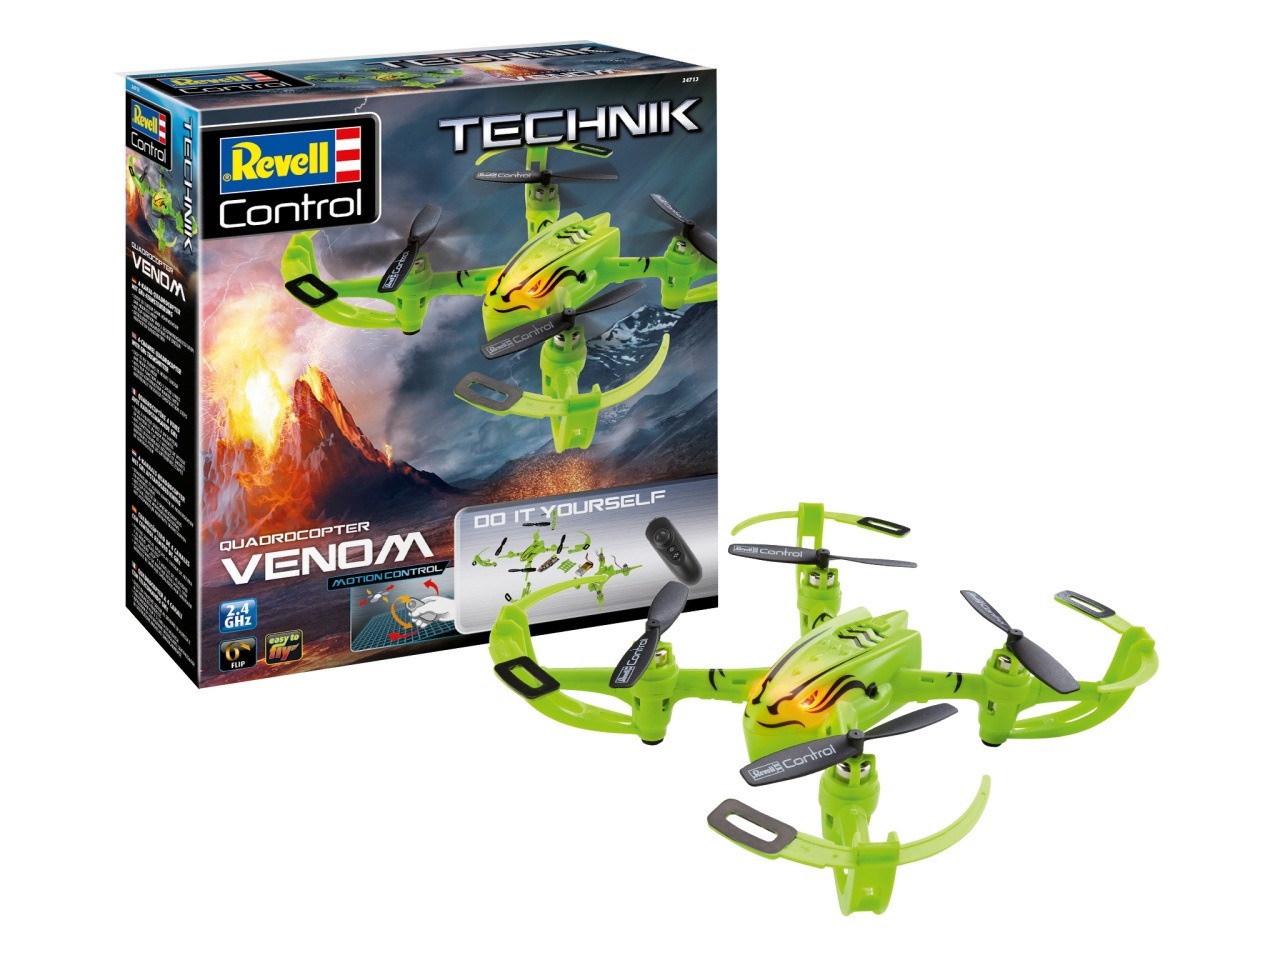 Revell RC TECHNIK Quadcopter VENOM